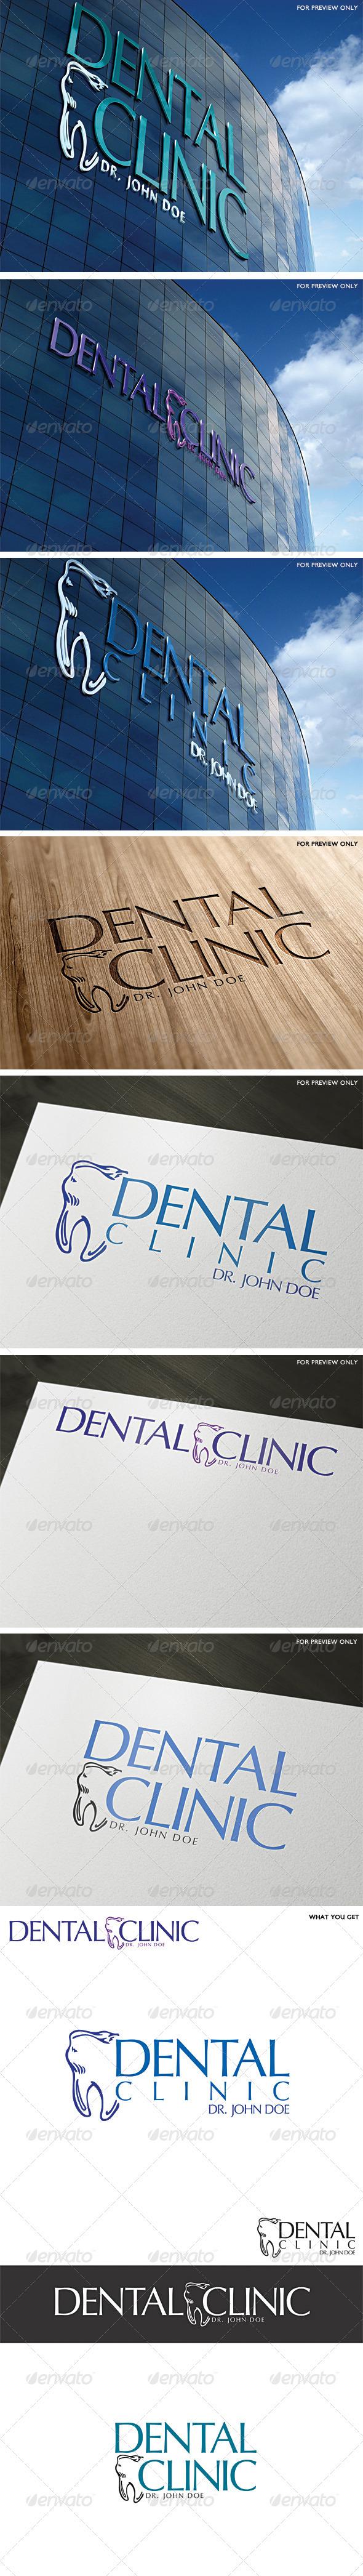 GraphicRiver Dental Clinic Logo Template 3940089